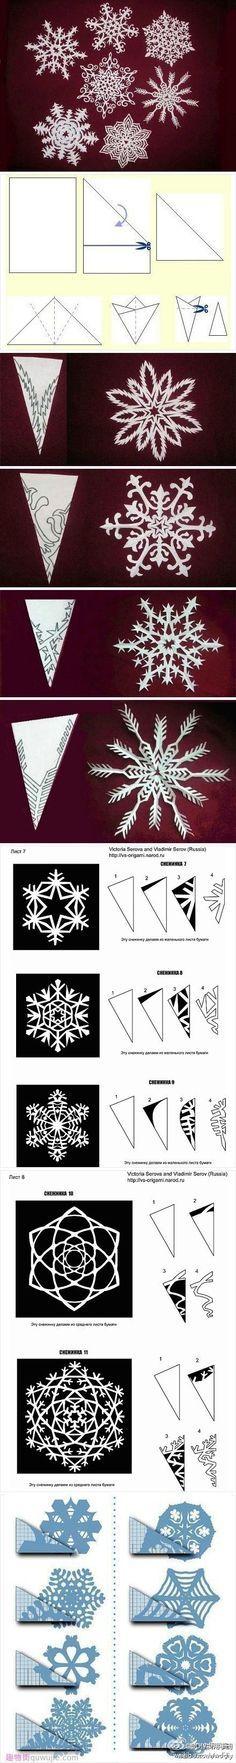 Paper snow flakes tutorial